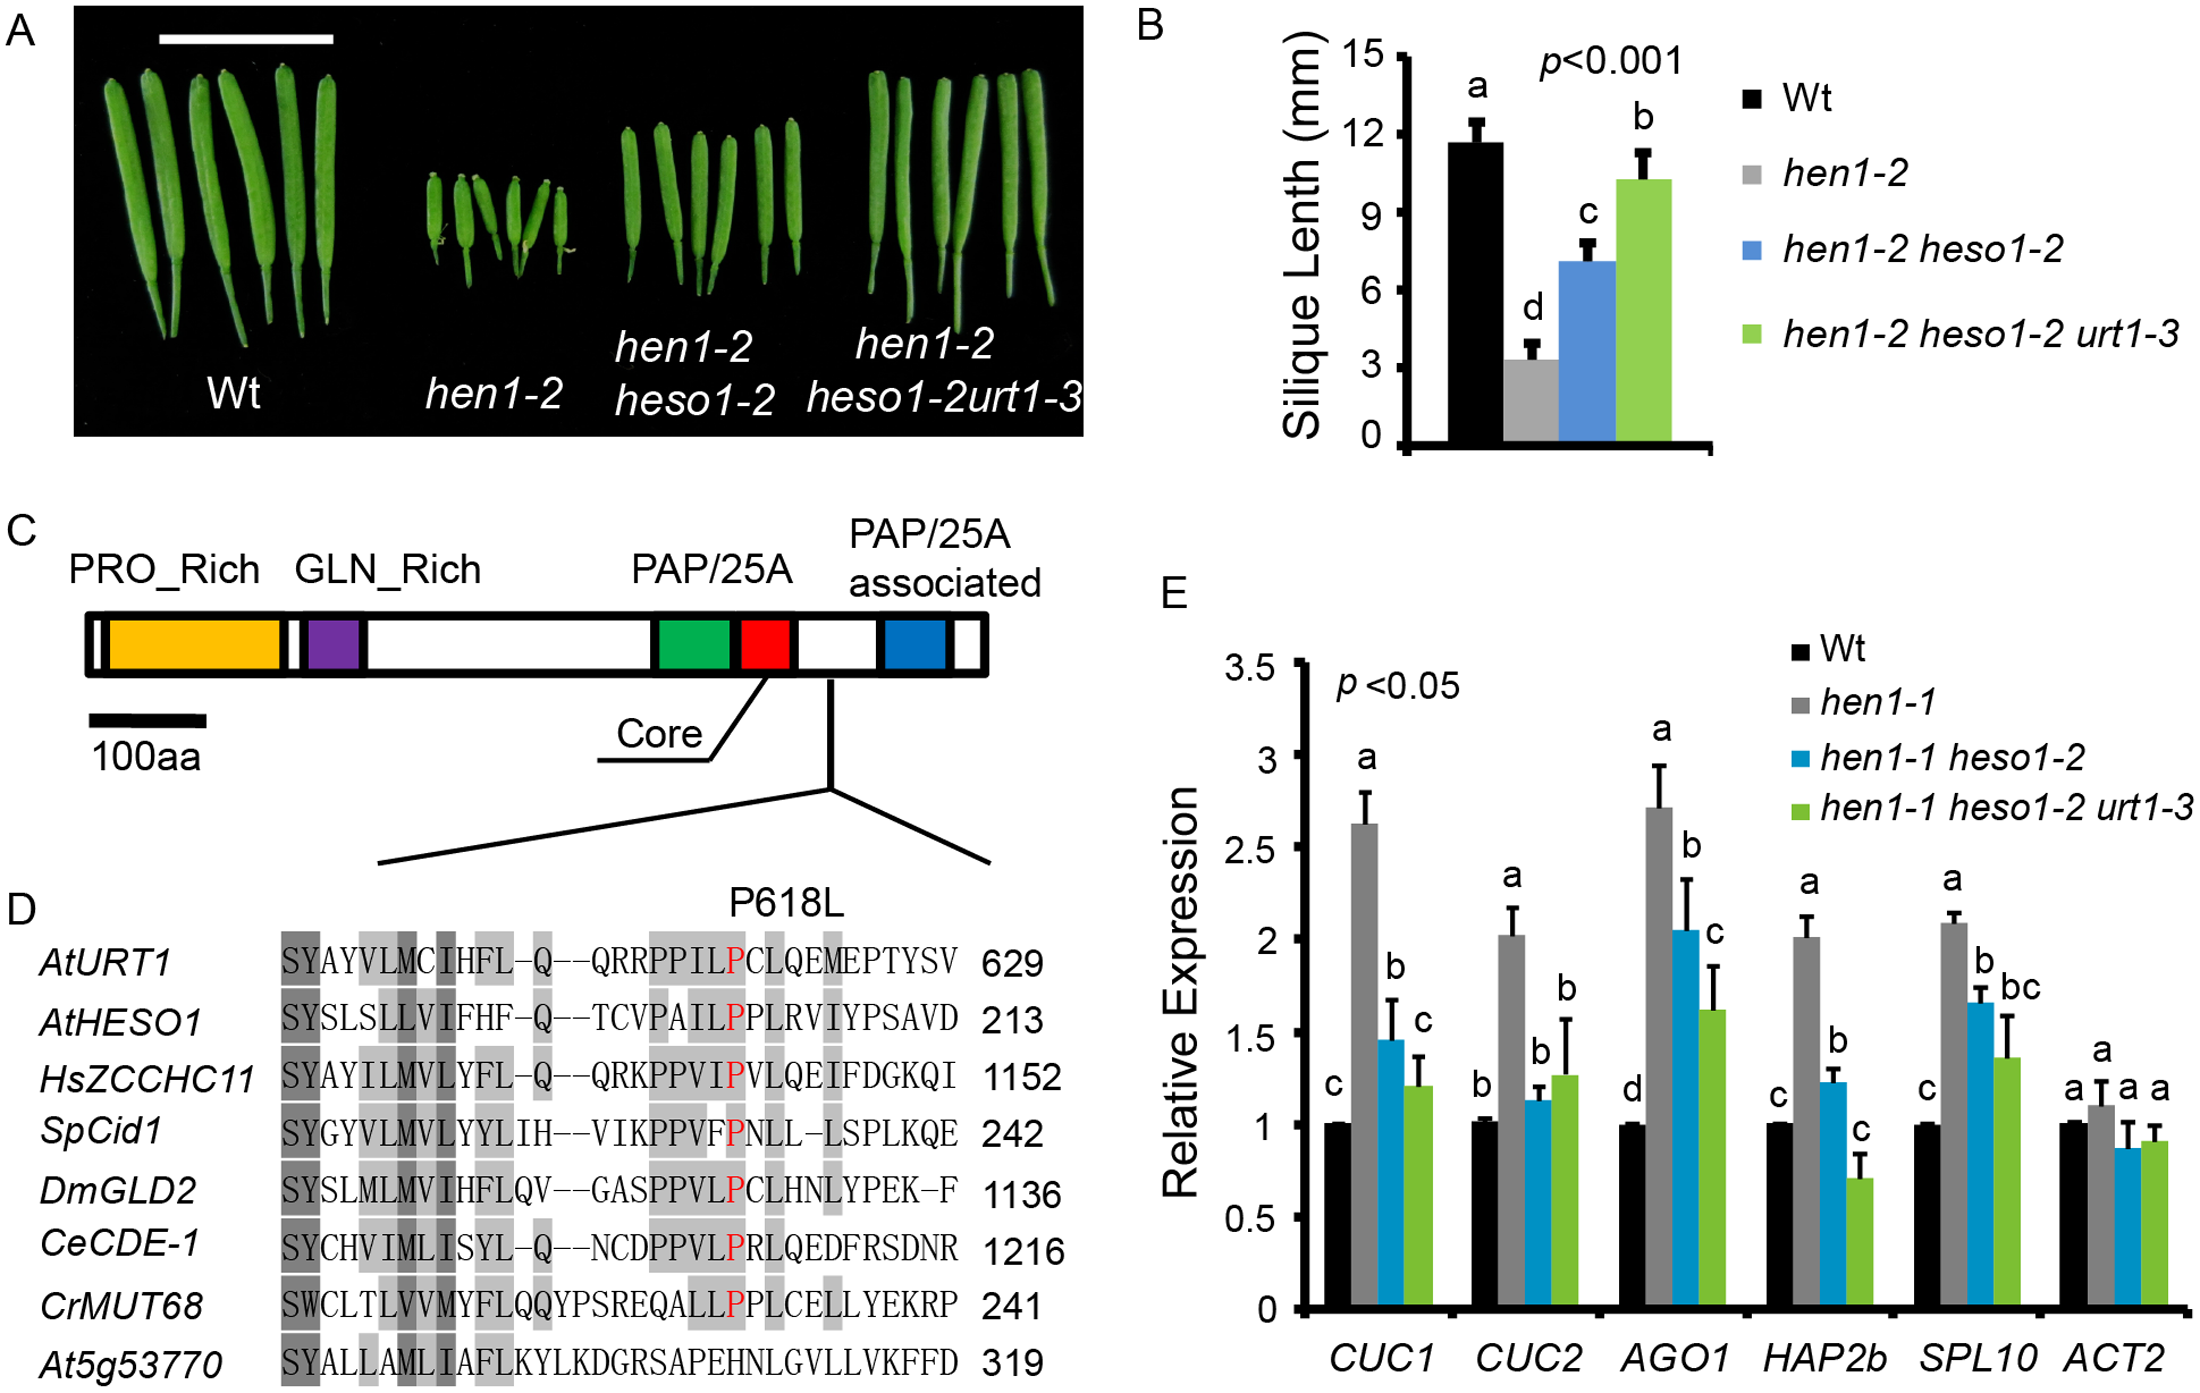 <i>urt1-3</i> increases the silique length in <i>hen1-2 heso1-2</i> and enhances miRNA function in <i>hen1-1 heso1-2</i>.